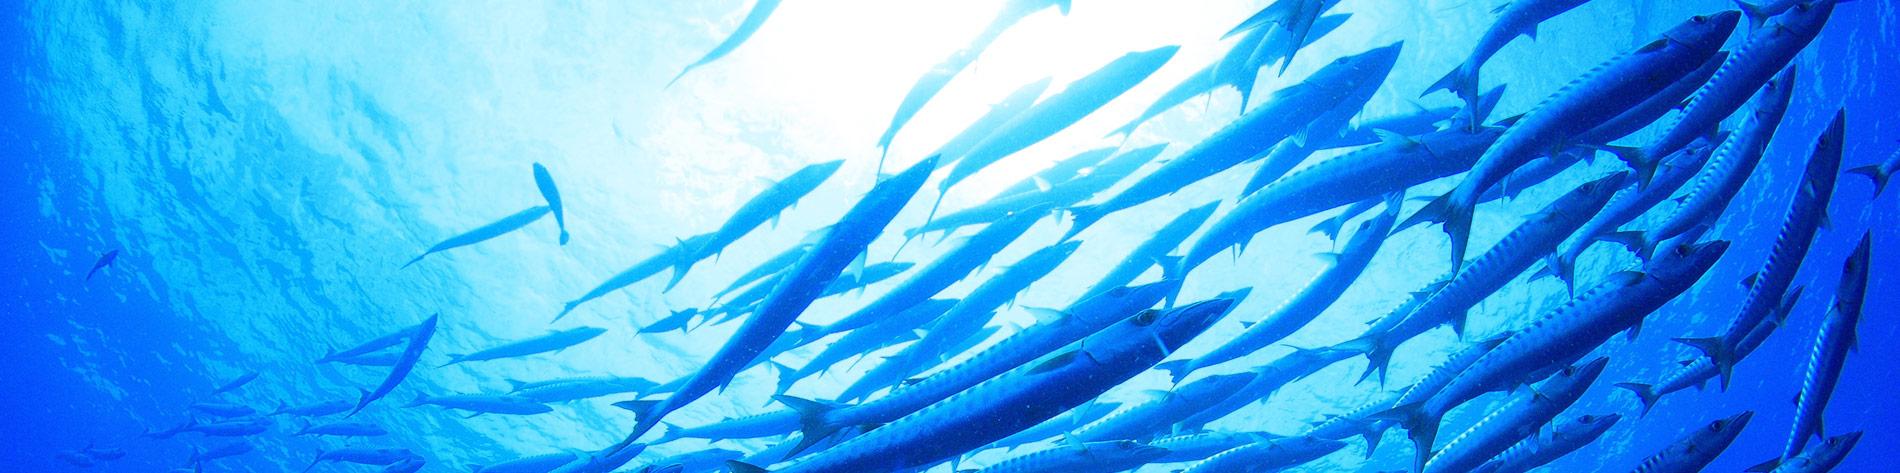 bandeau-poisson